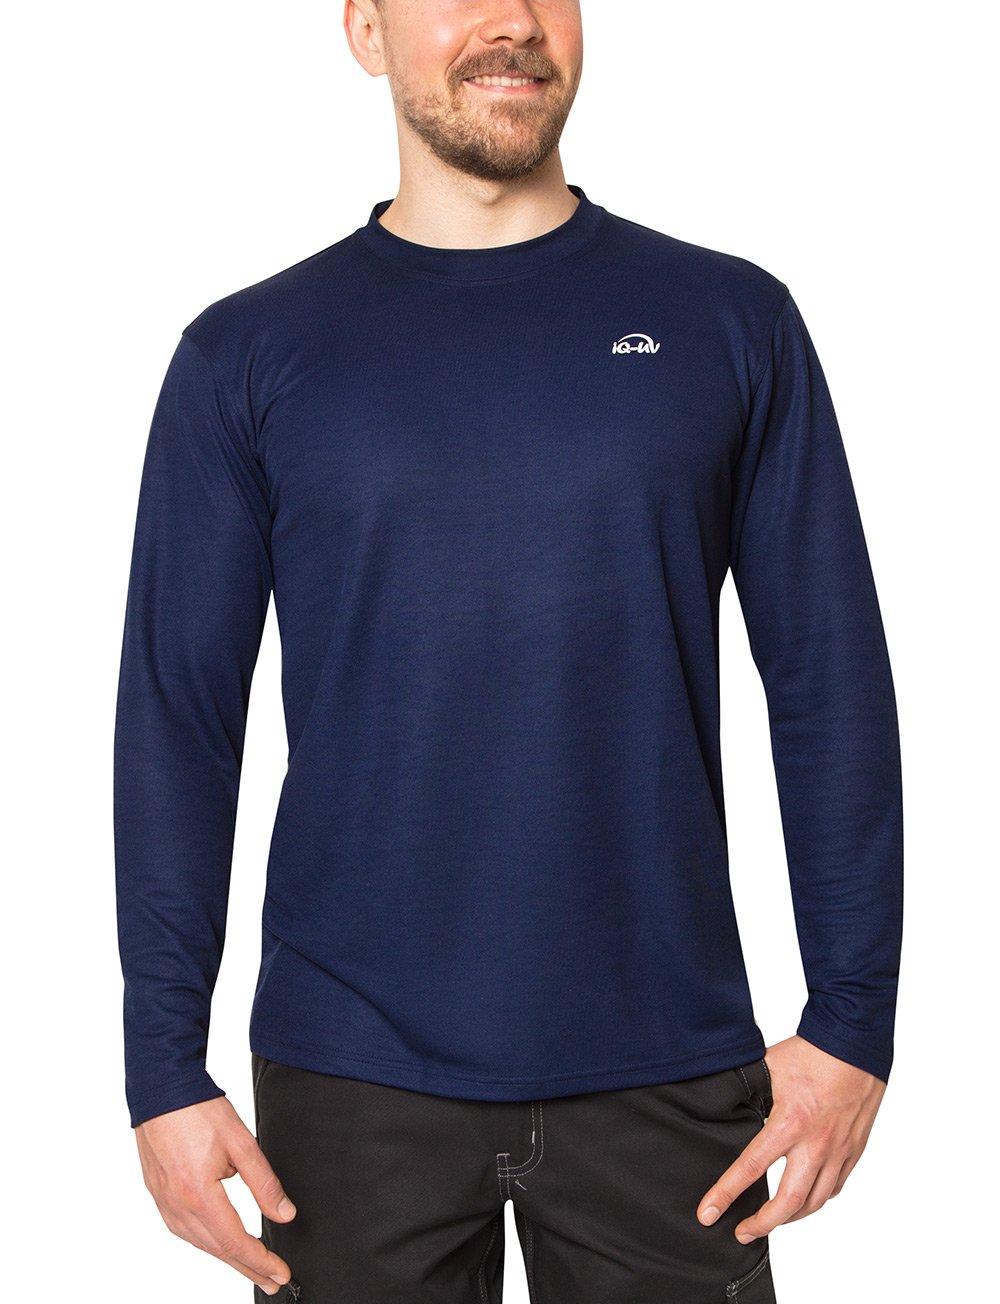 iQ-UV 50 –  Camiseta de, Protecció n Solar Cuello Redondo, Corte Regular, Fabricado en Europa Protecció n UV Manga Larga Camiseta Protección Solar Cuello Redondo Fabricado en Europa Protección UV Manga Larga Camiseta